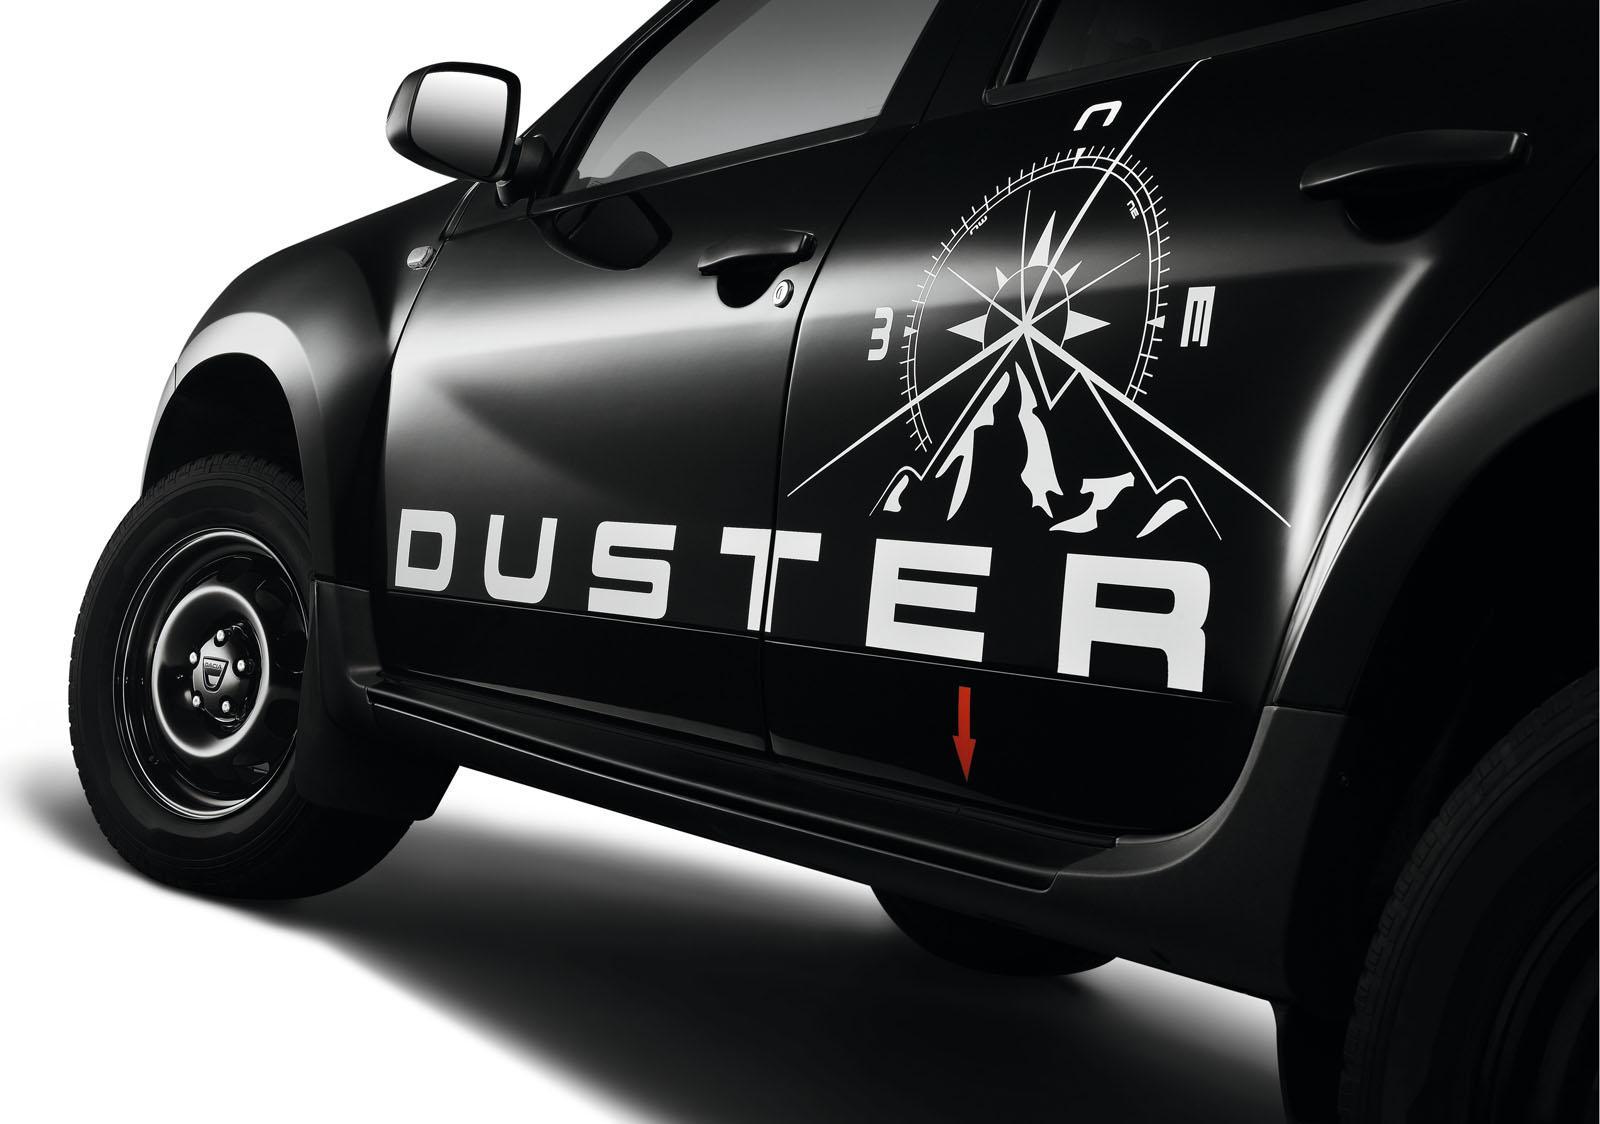 2013 Geneva Motor Show: Dacia Duster Adventure Edition  - фотография №11